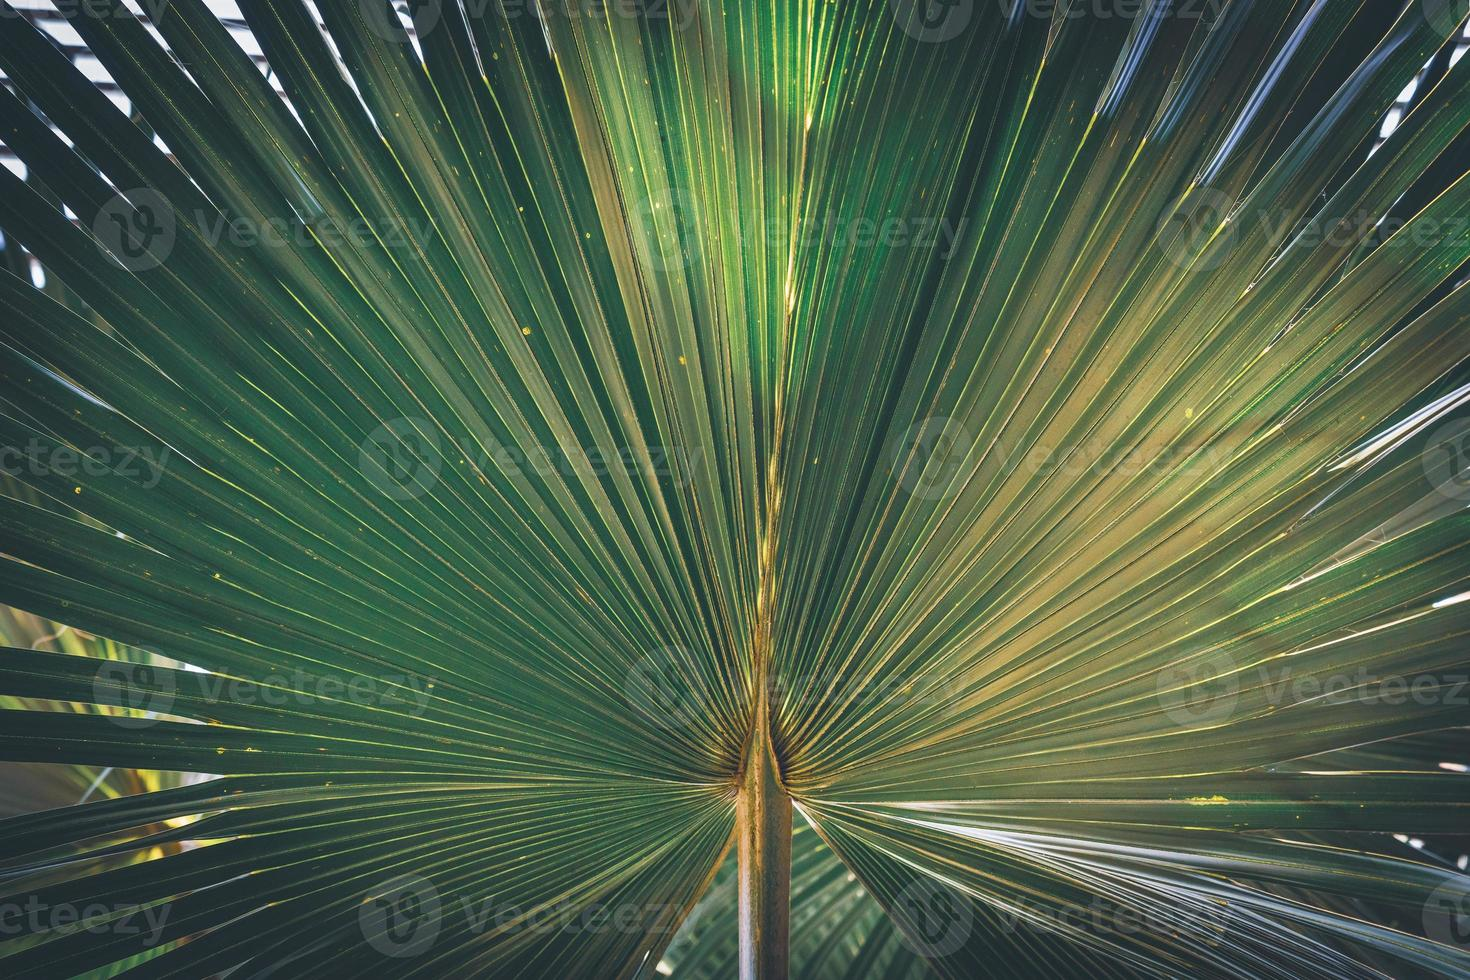 california fan palm foto